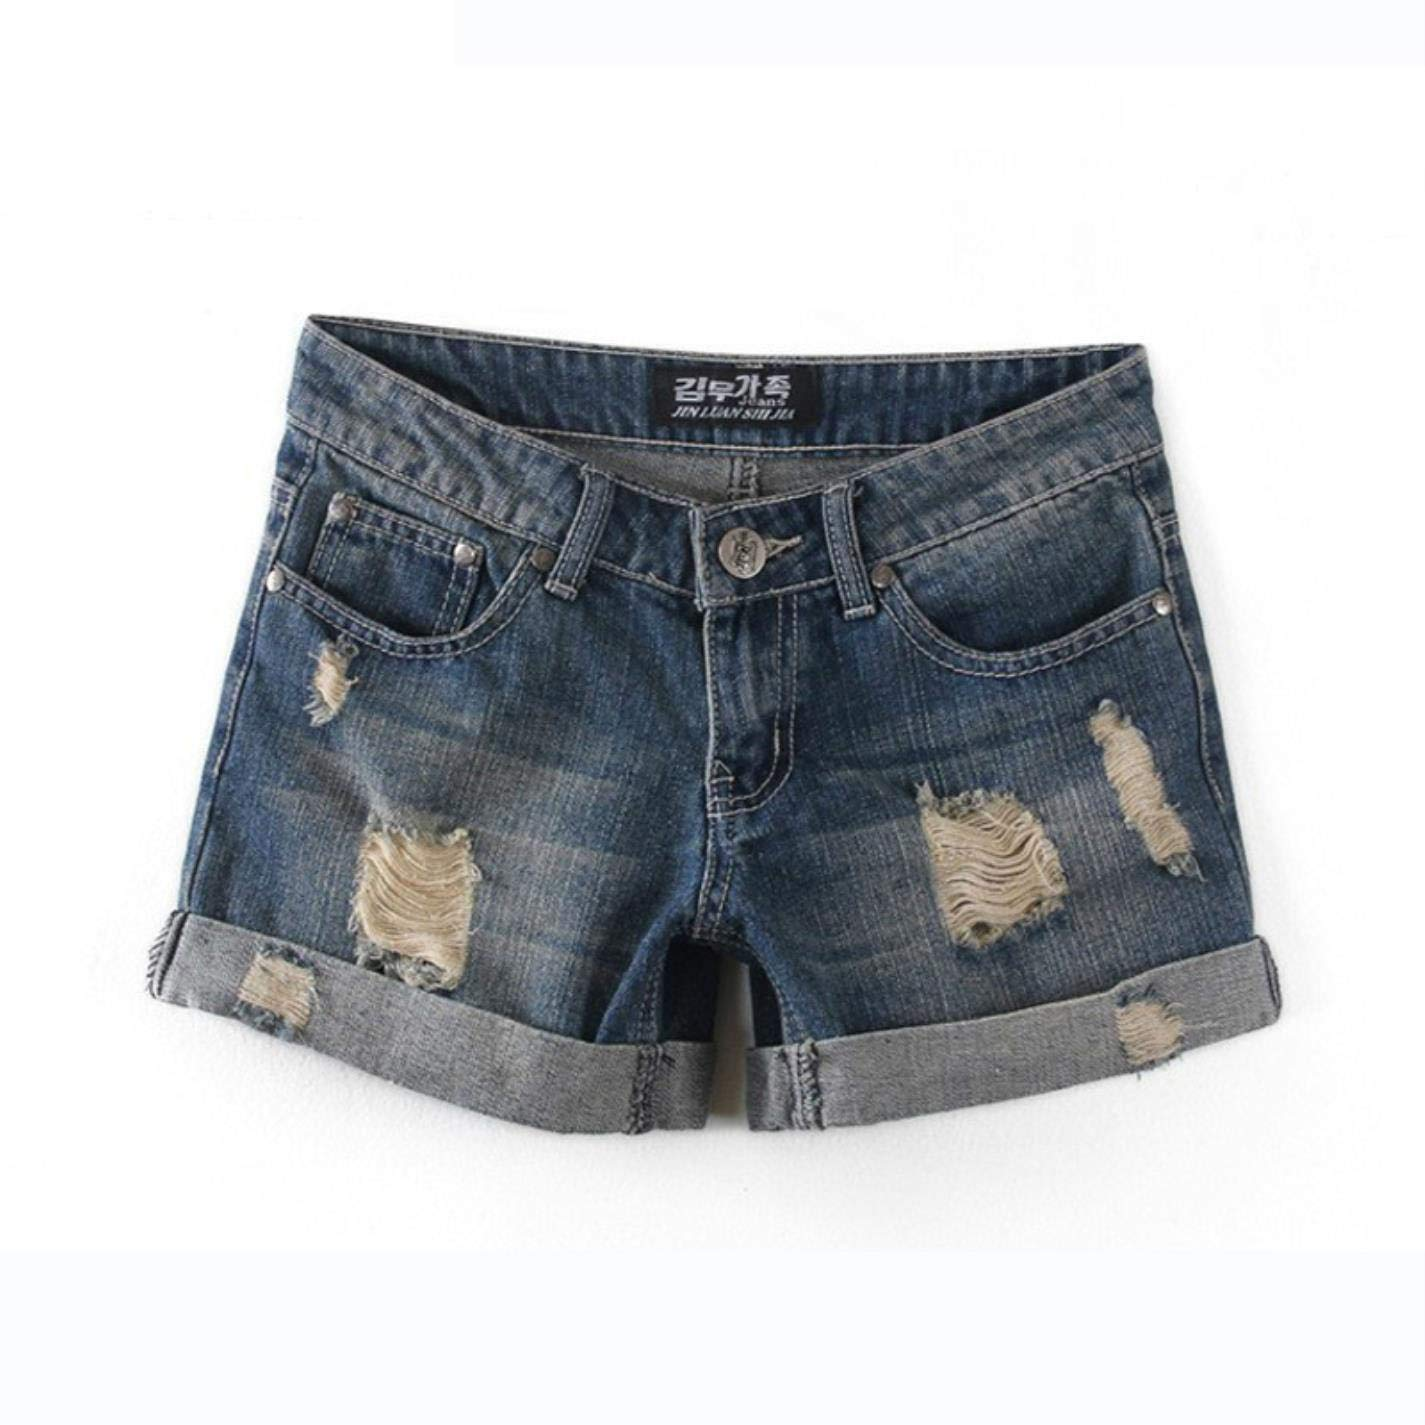 QzJXJbLe Womens Button Hole high Waist Cotton Denim Shorts